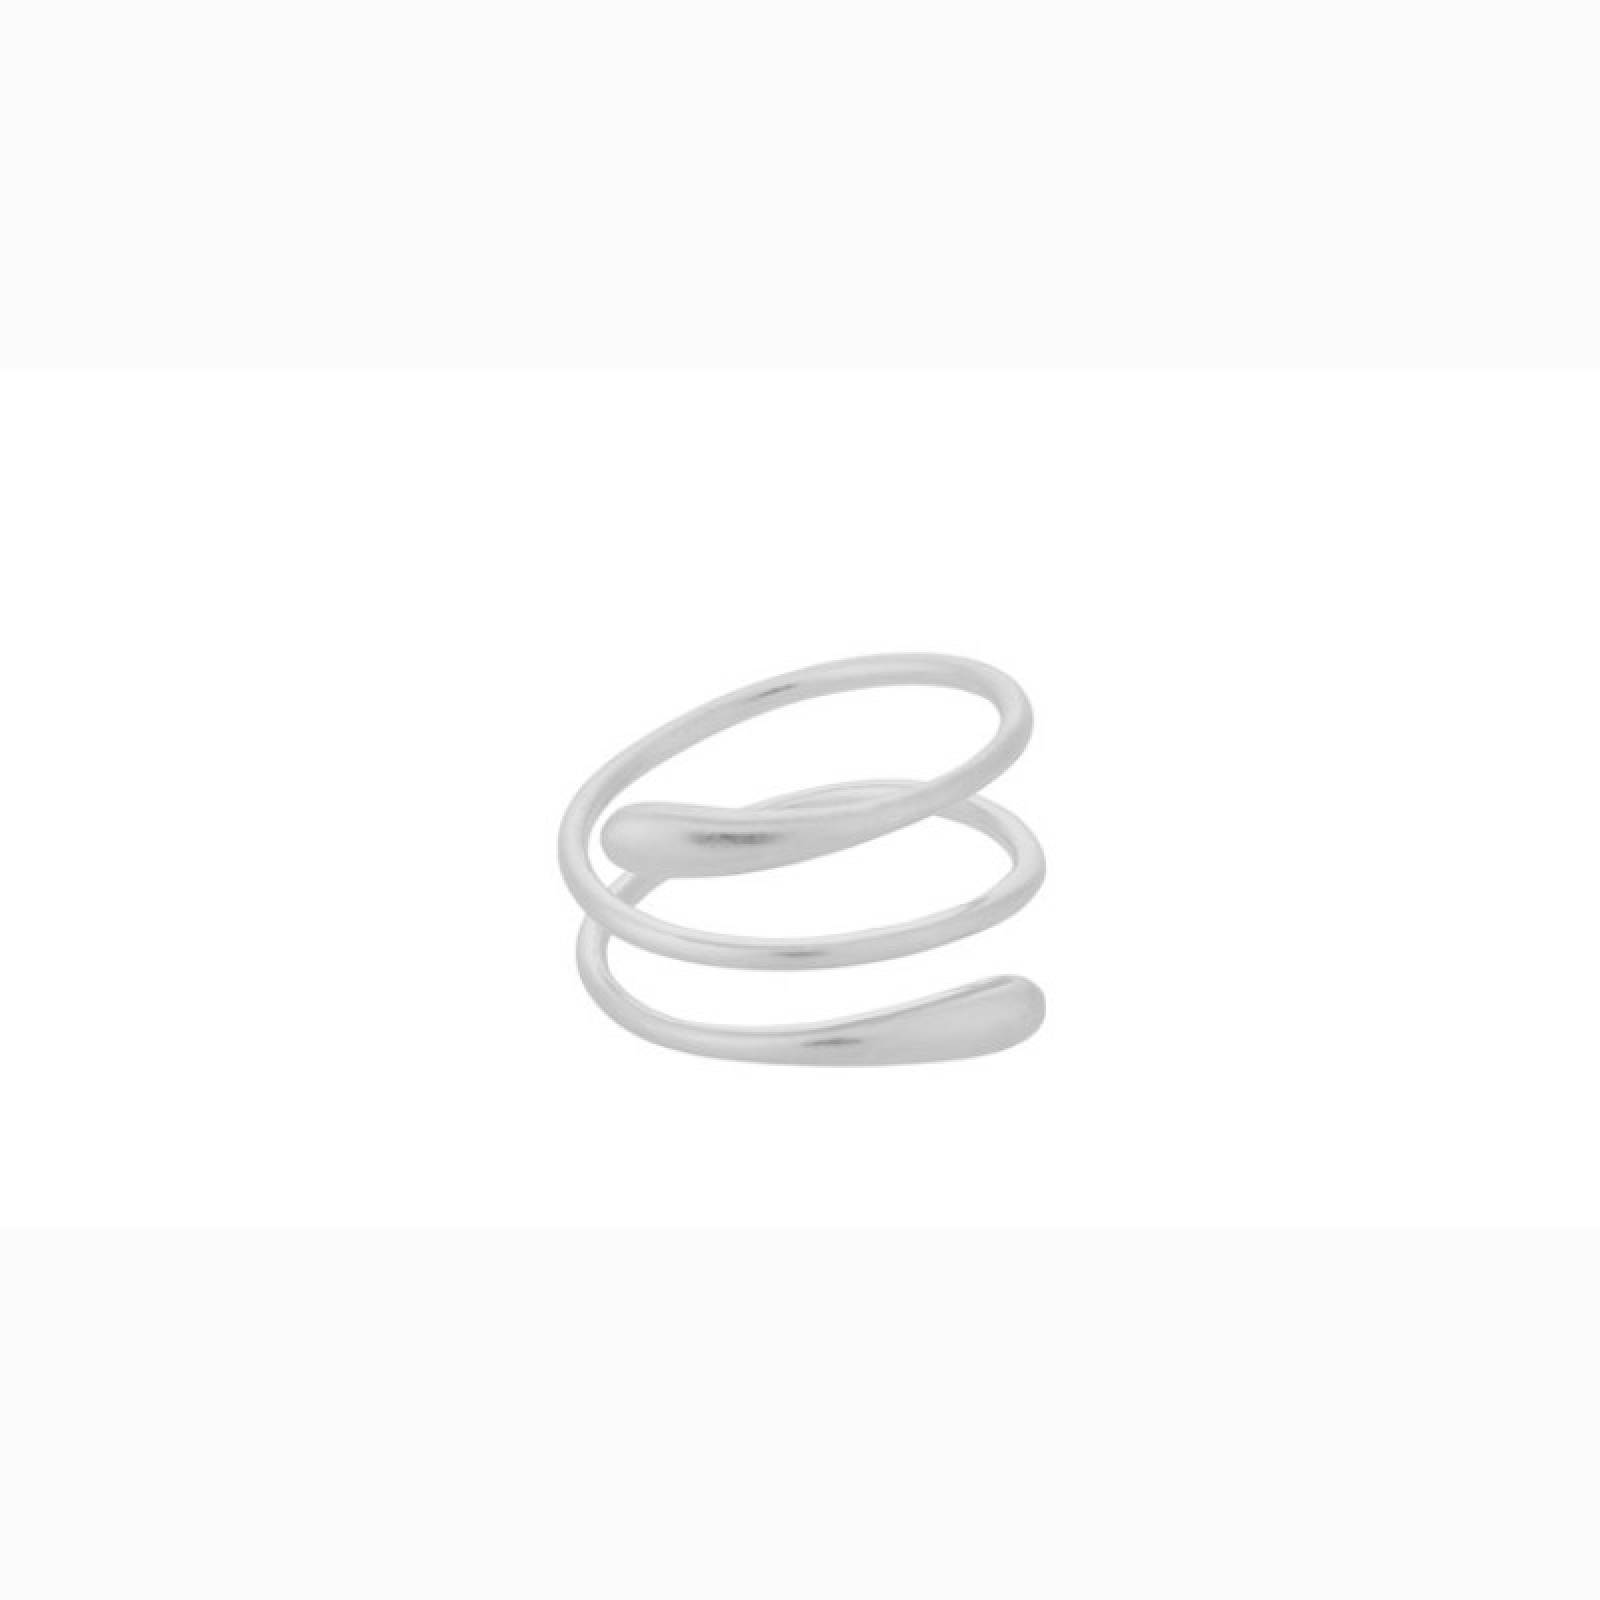 Waterdrop Ring In Silver By Pernille Corydon